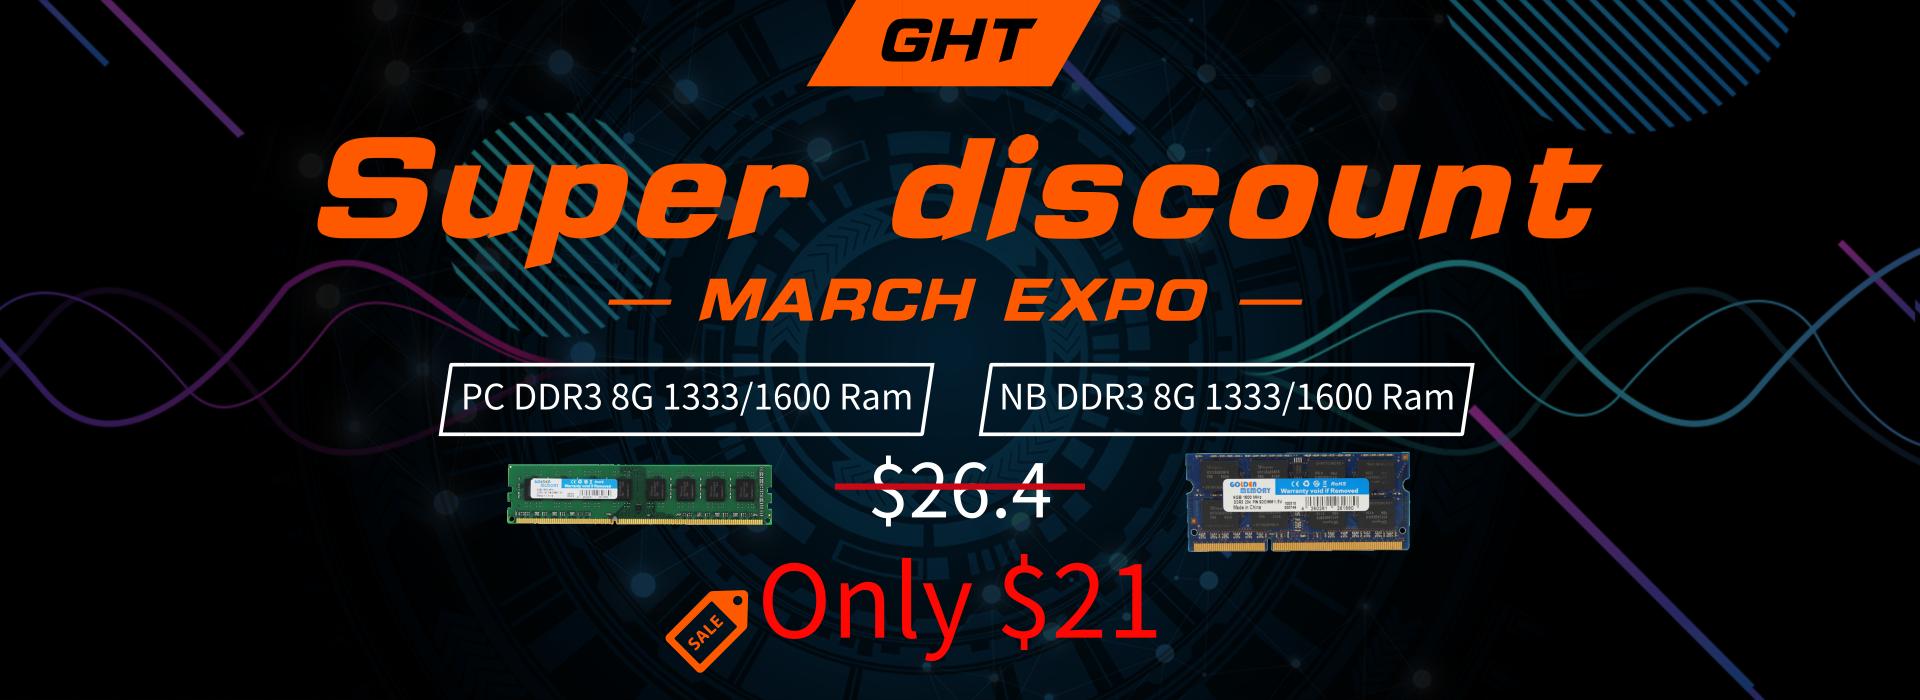 High Speed 1.5V Ddr3 4Gb 1600Mhz Ram With Heat Spreader